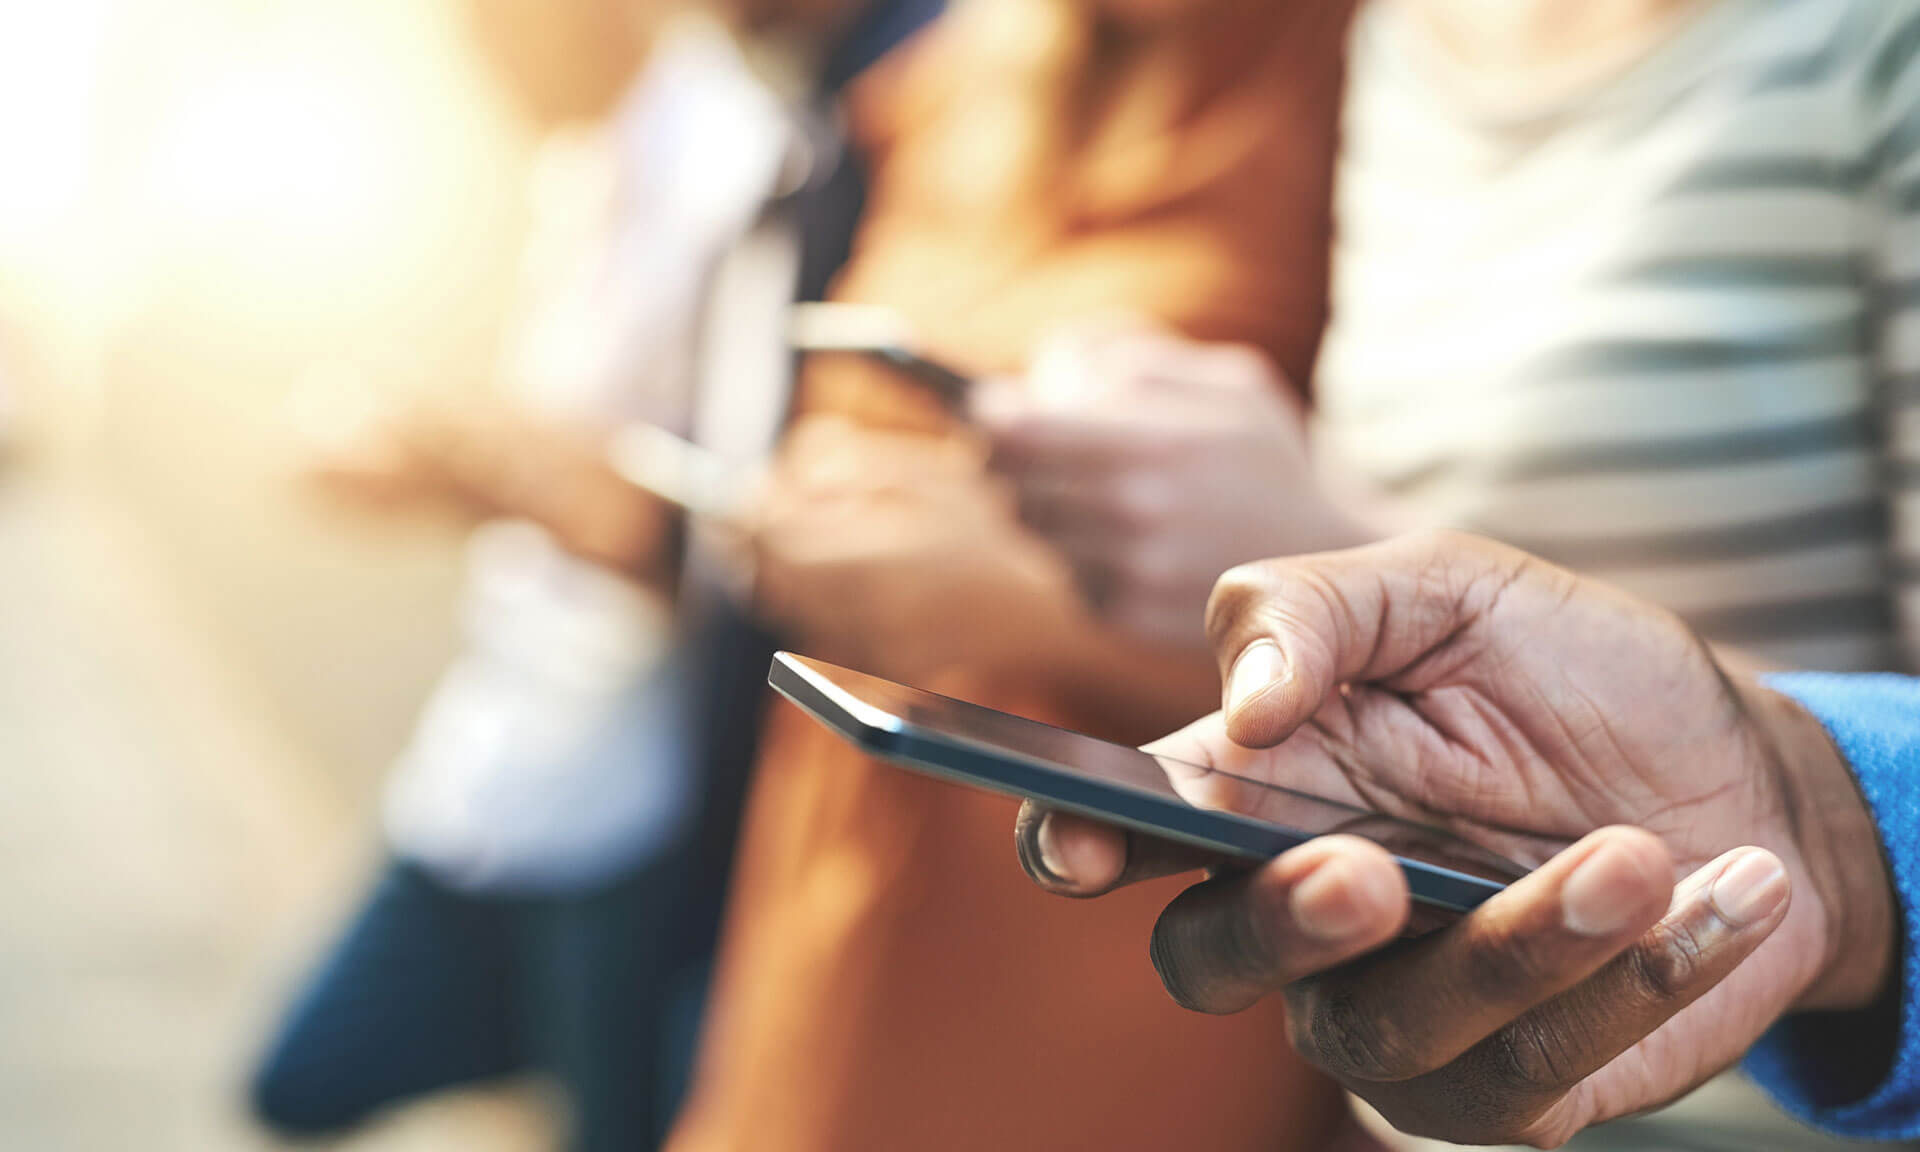 Mobilabonnement uten mobildata